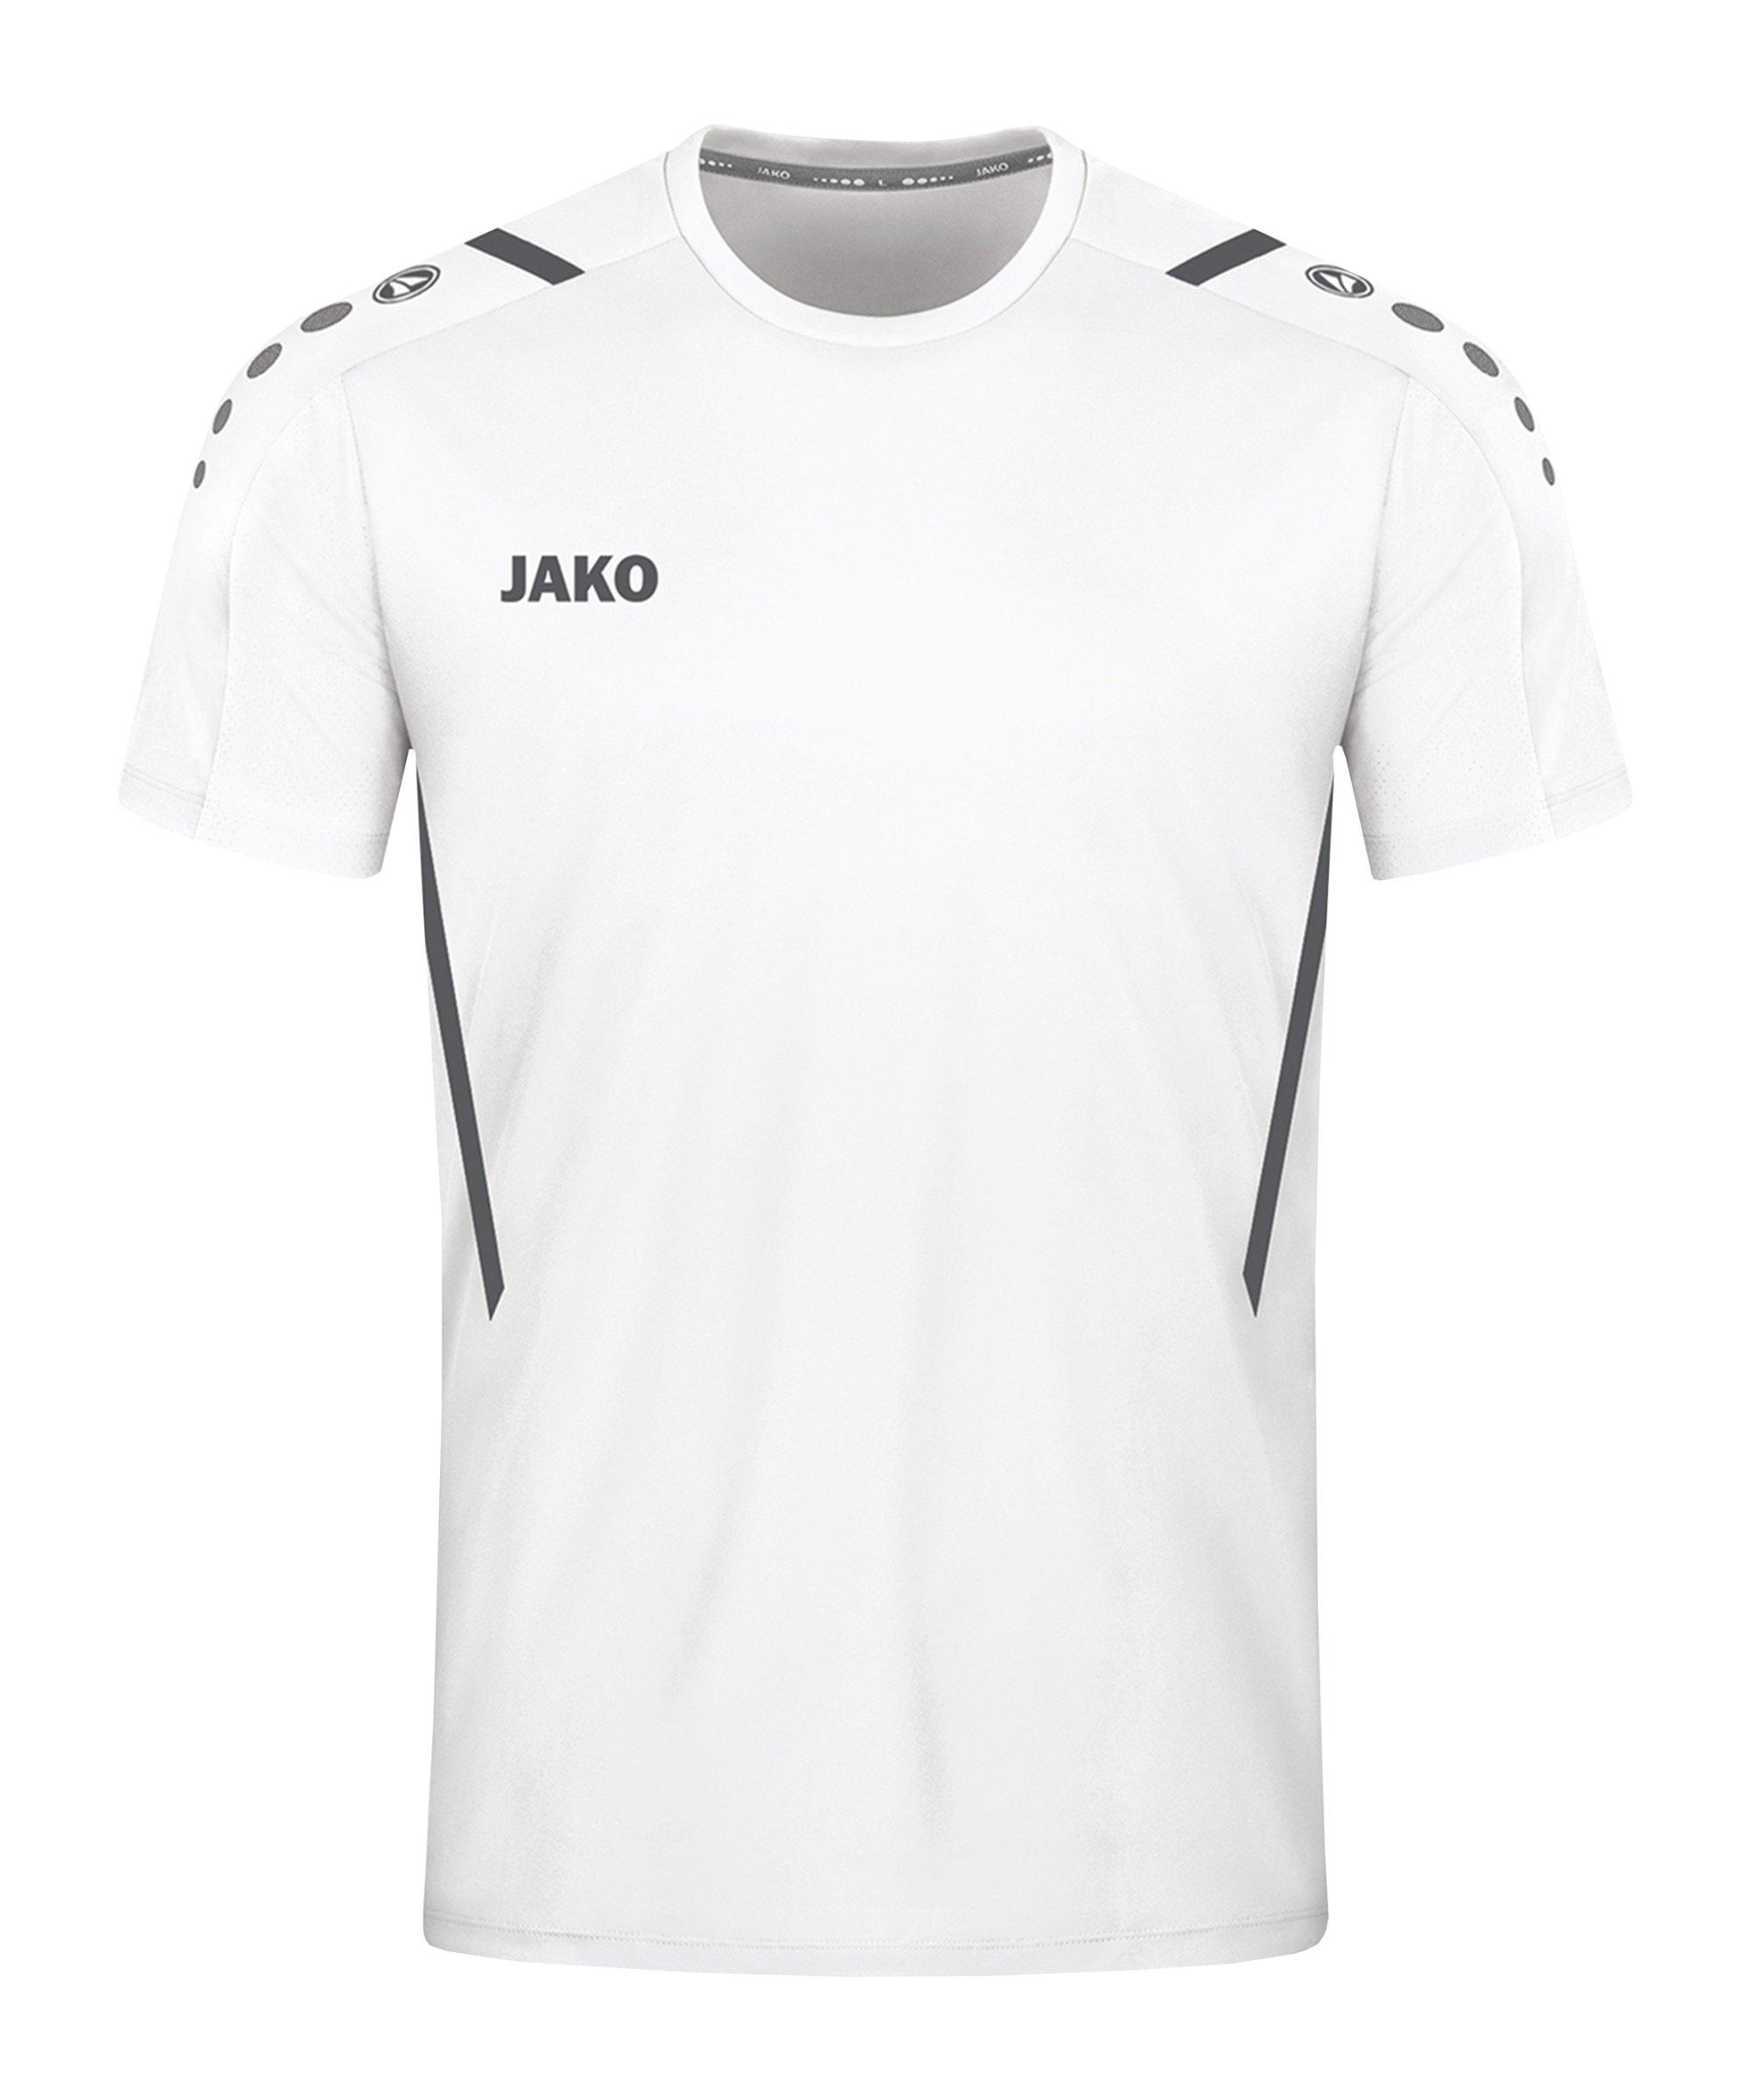 JAKO Challenge Trikot Kids Weiss Grau F02 - weiss